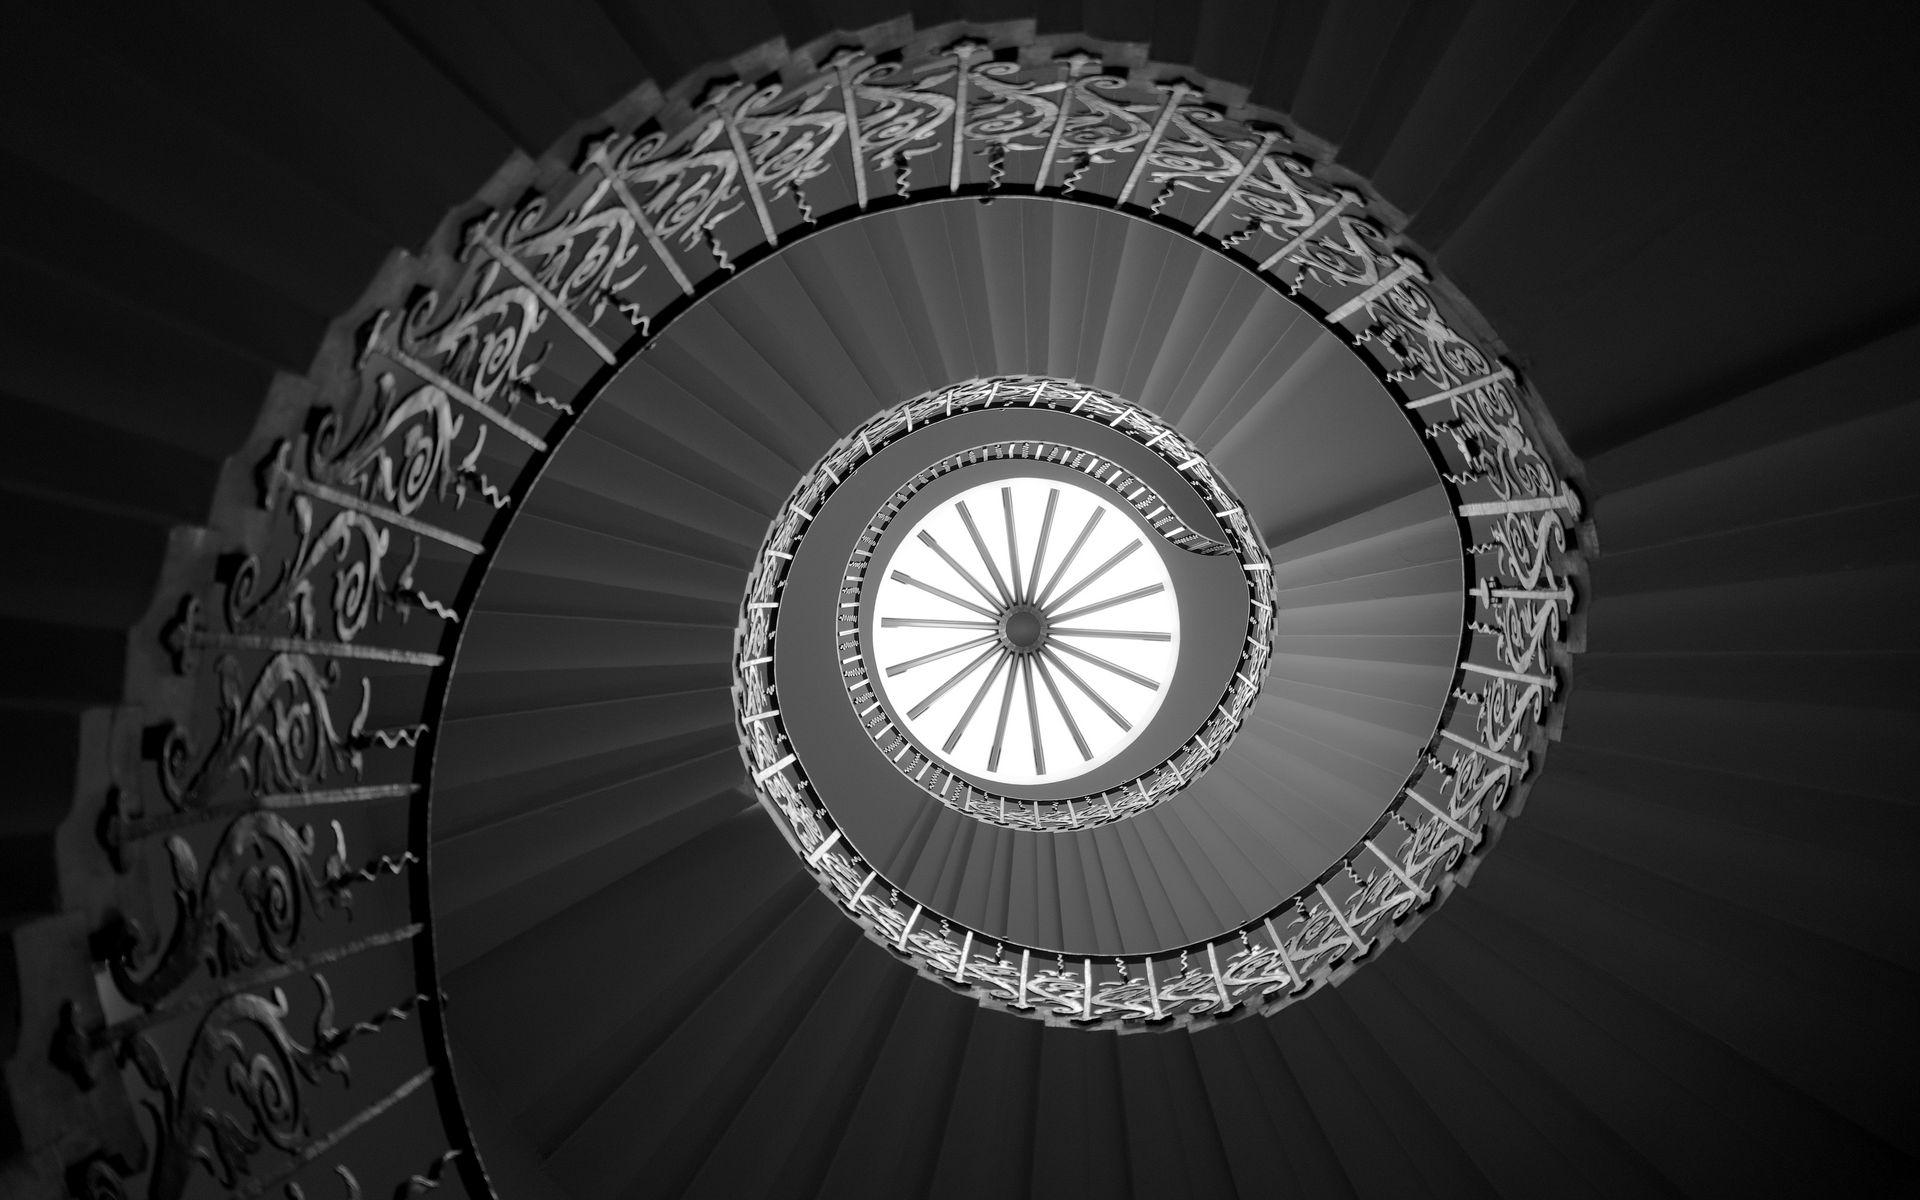 1920x1200 Wallpaper ladder, spiral, bottom view, bw